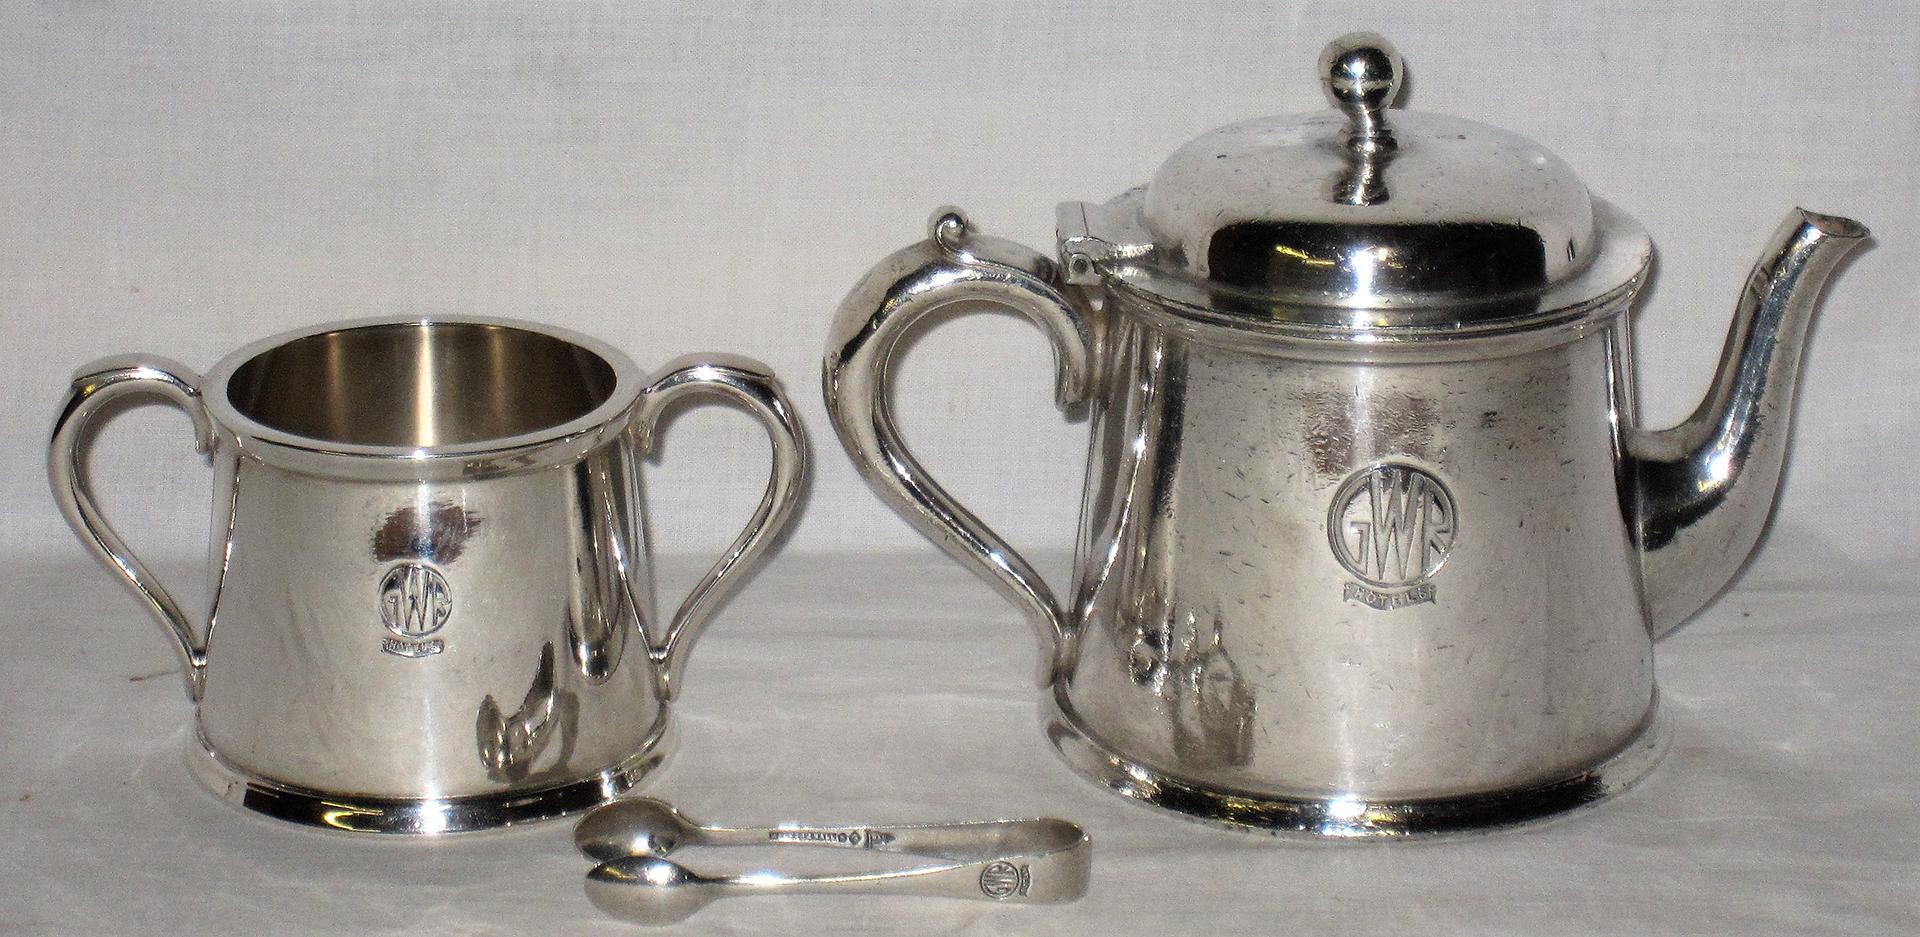 3 x pieces of GWR table silverware. GWR Tea Pot. GWR sugar bowl and a GWR Sugar tongs all in